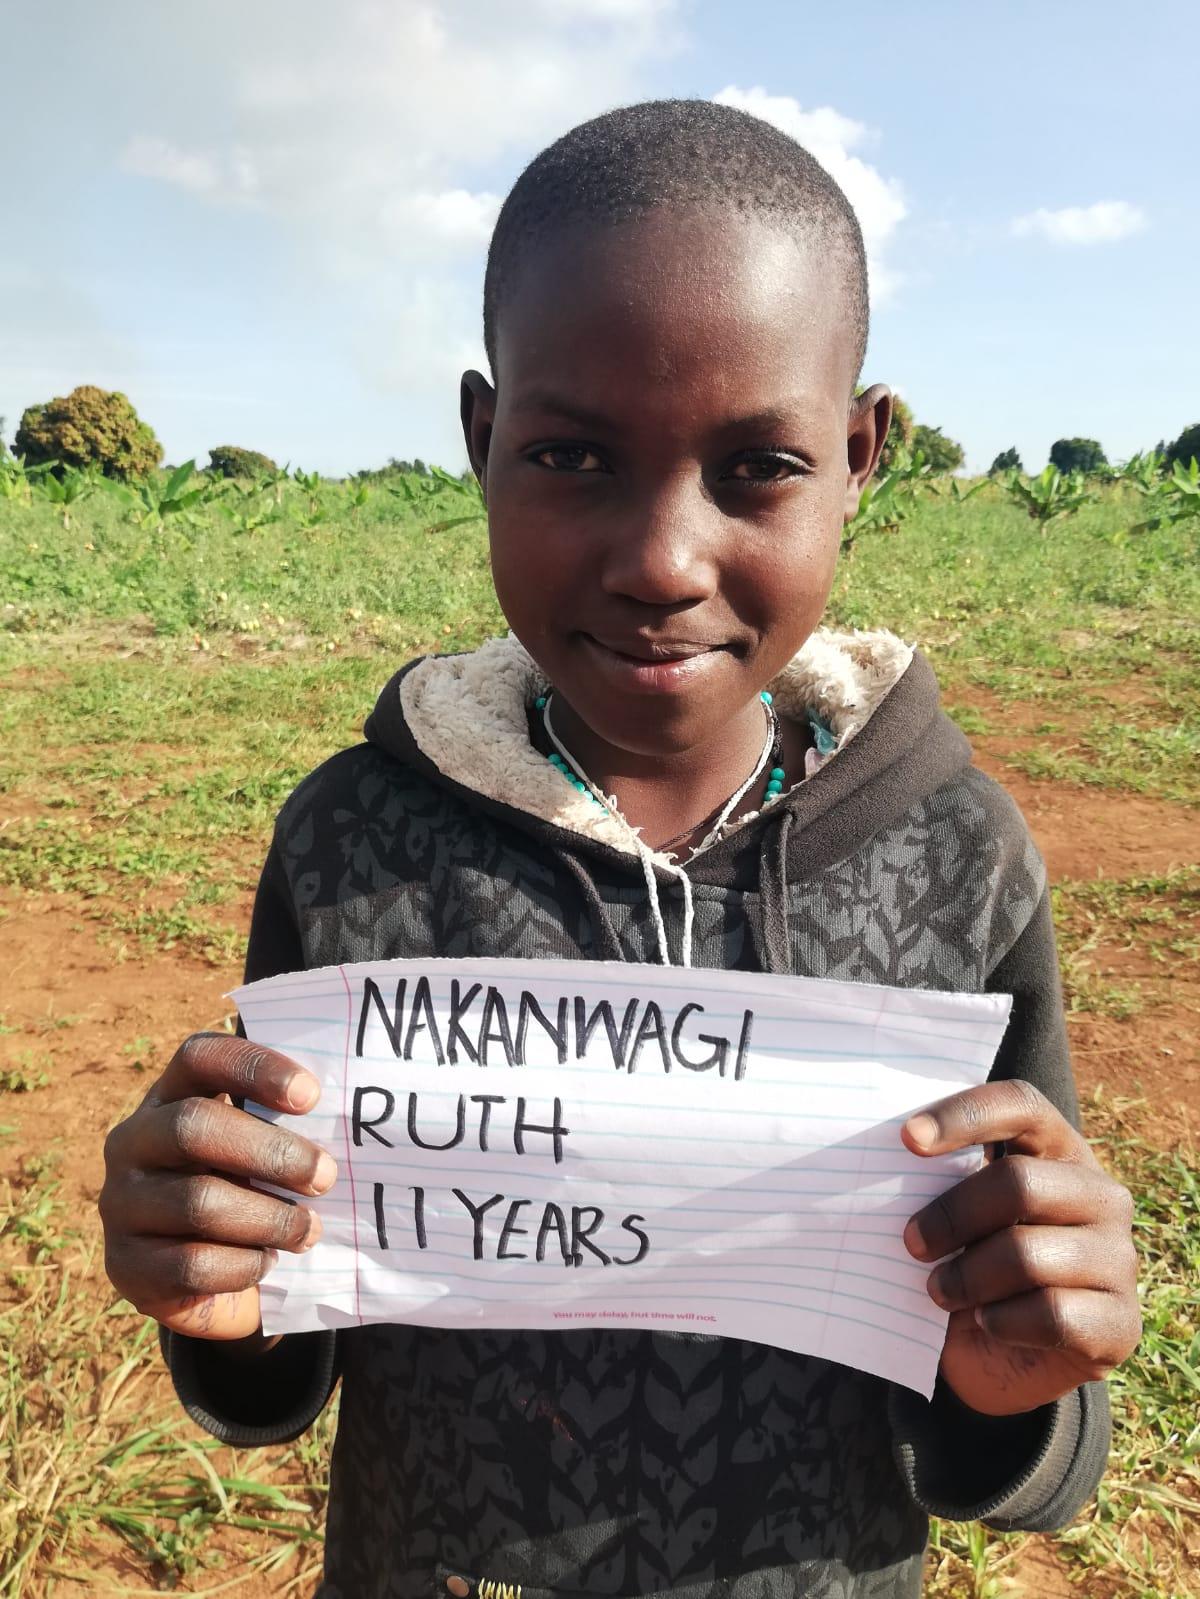 Nakanwagi,Ruth